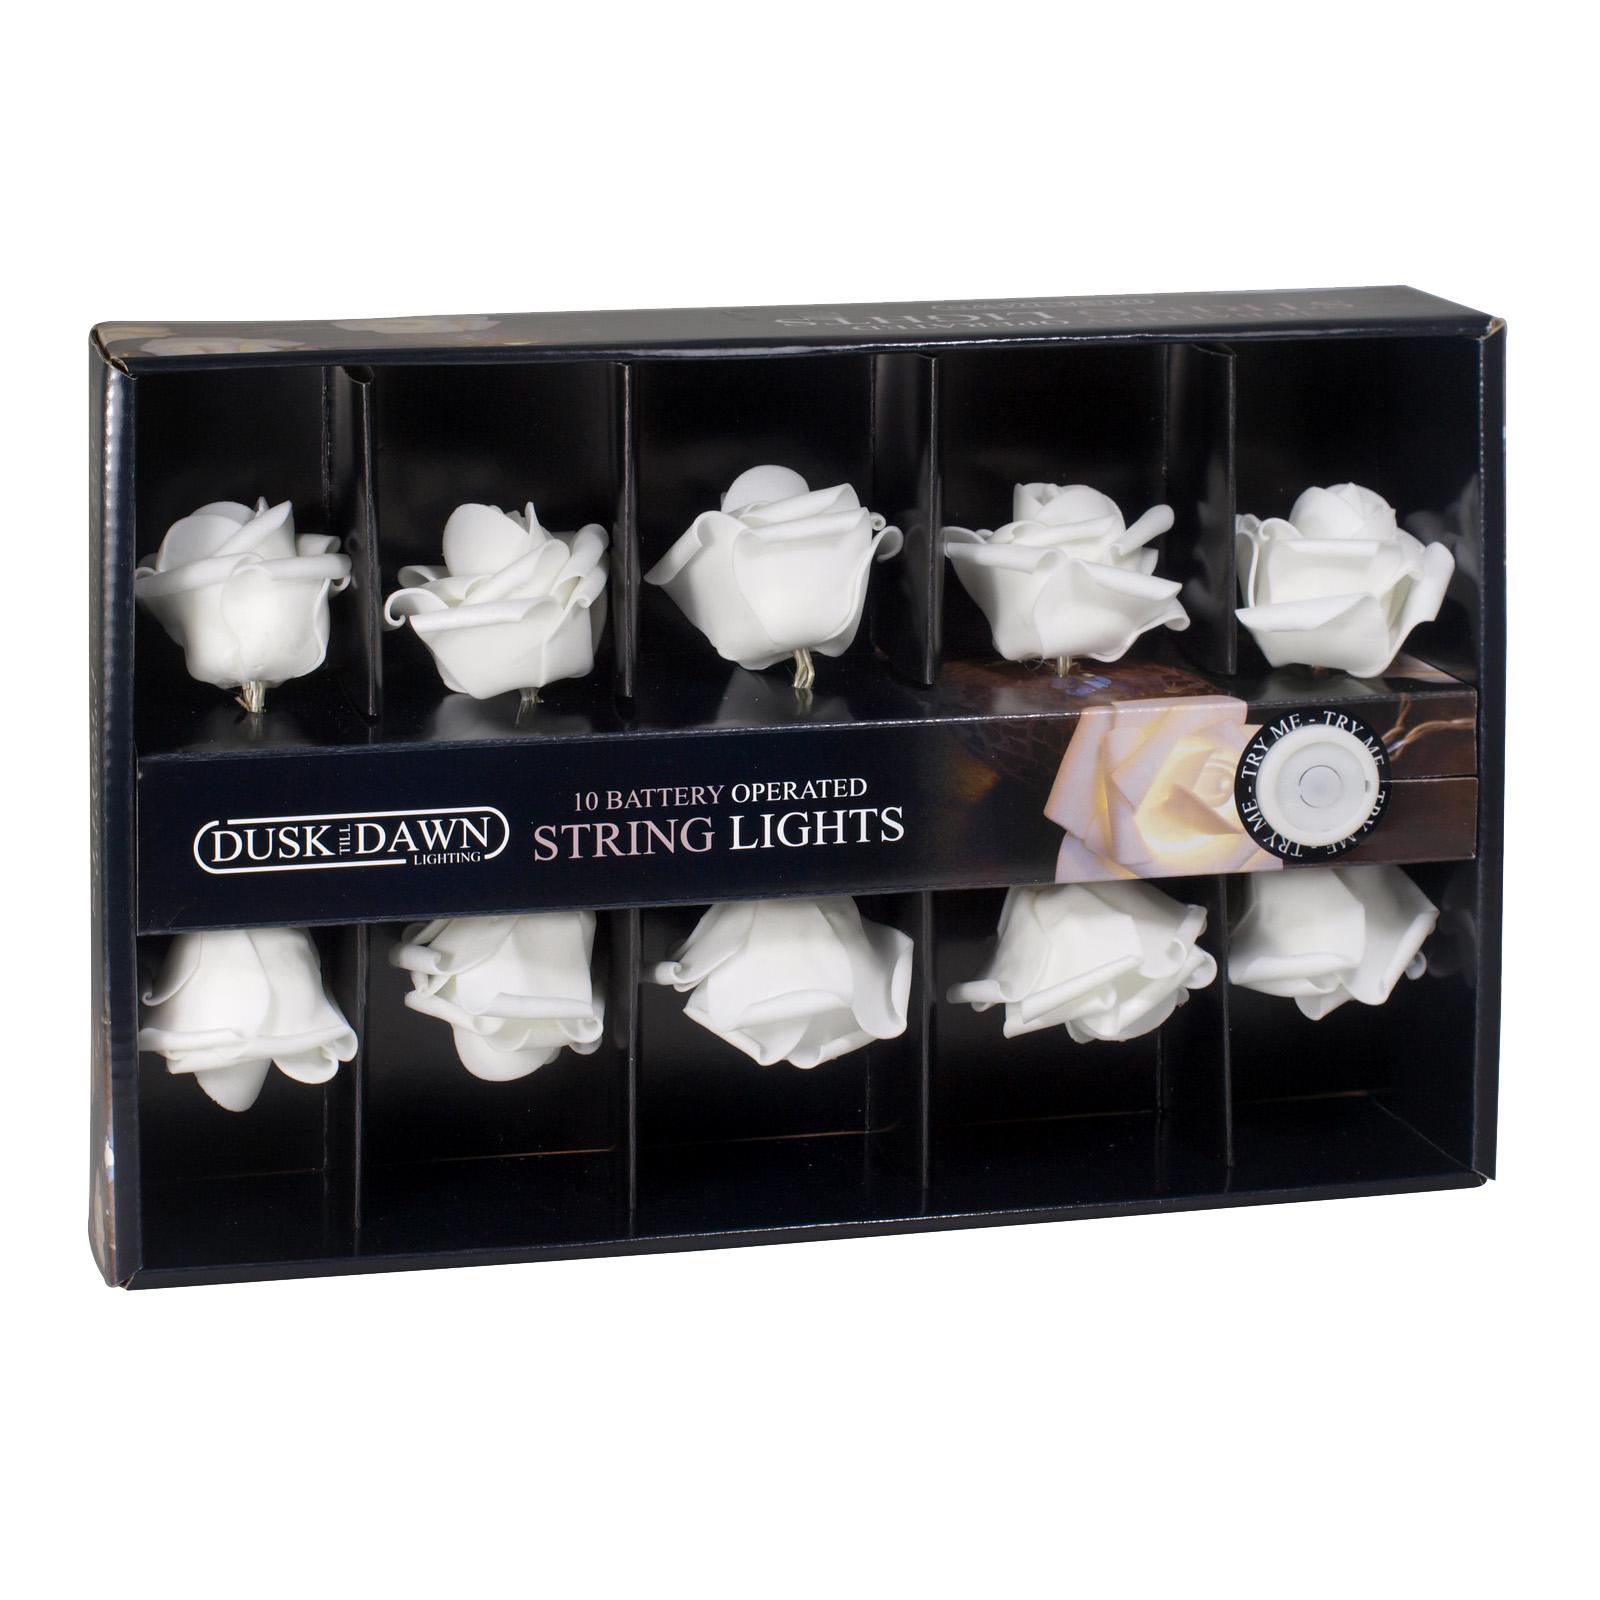 DUSKTILLDAWN B/O 10 INDOOR STRING LIGHTS WHITE ROSES